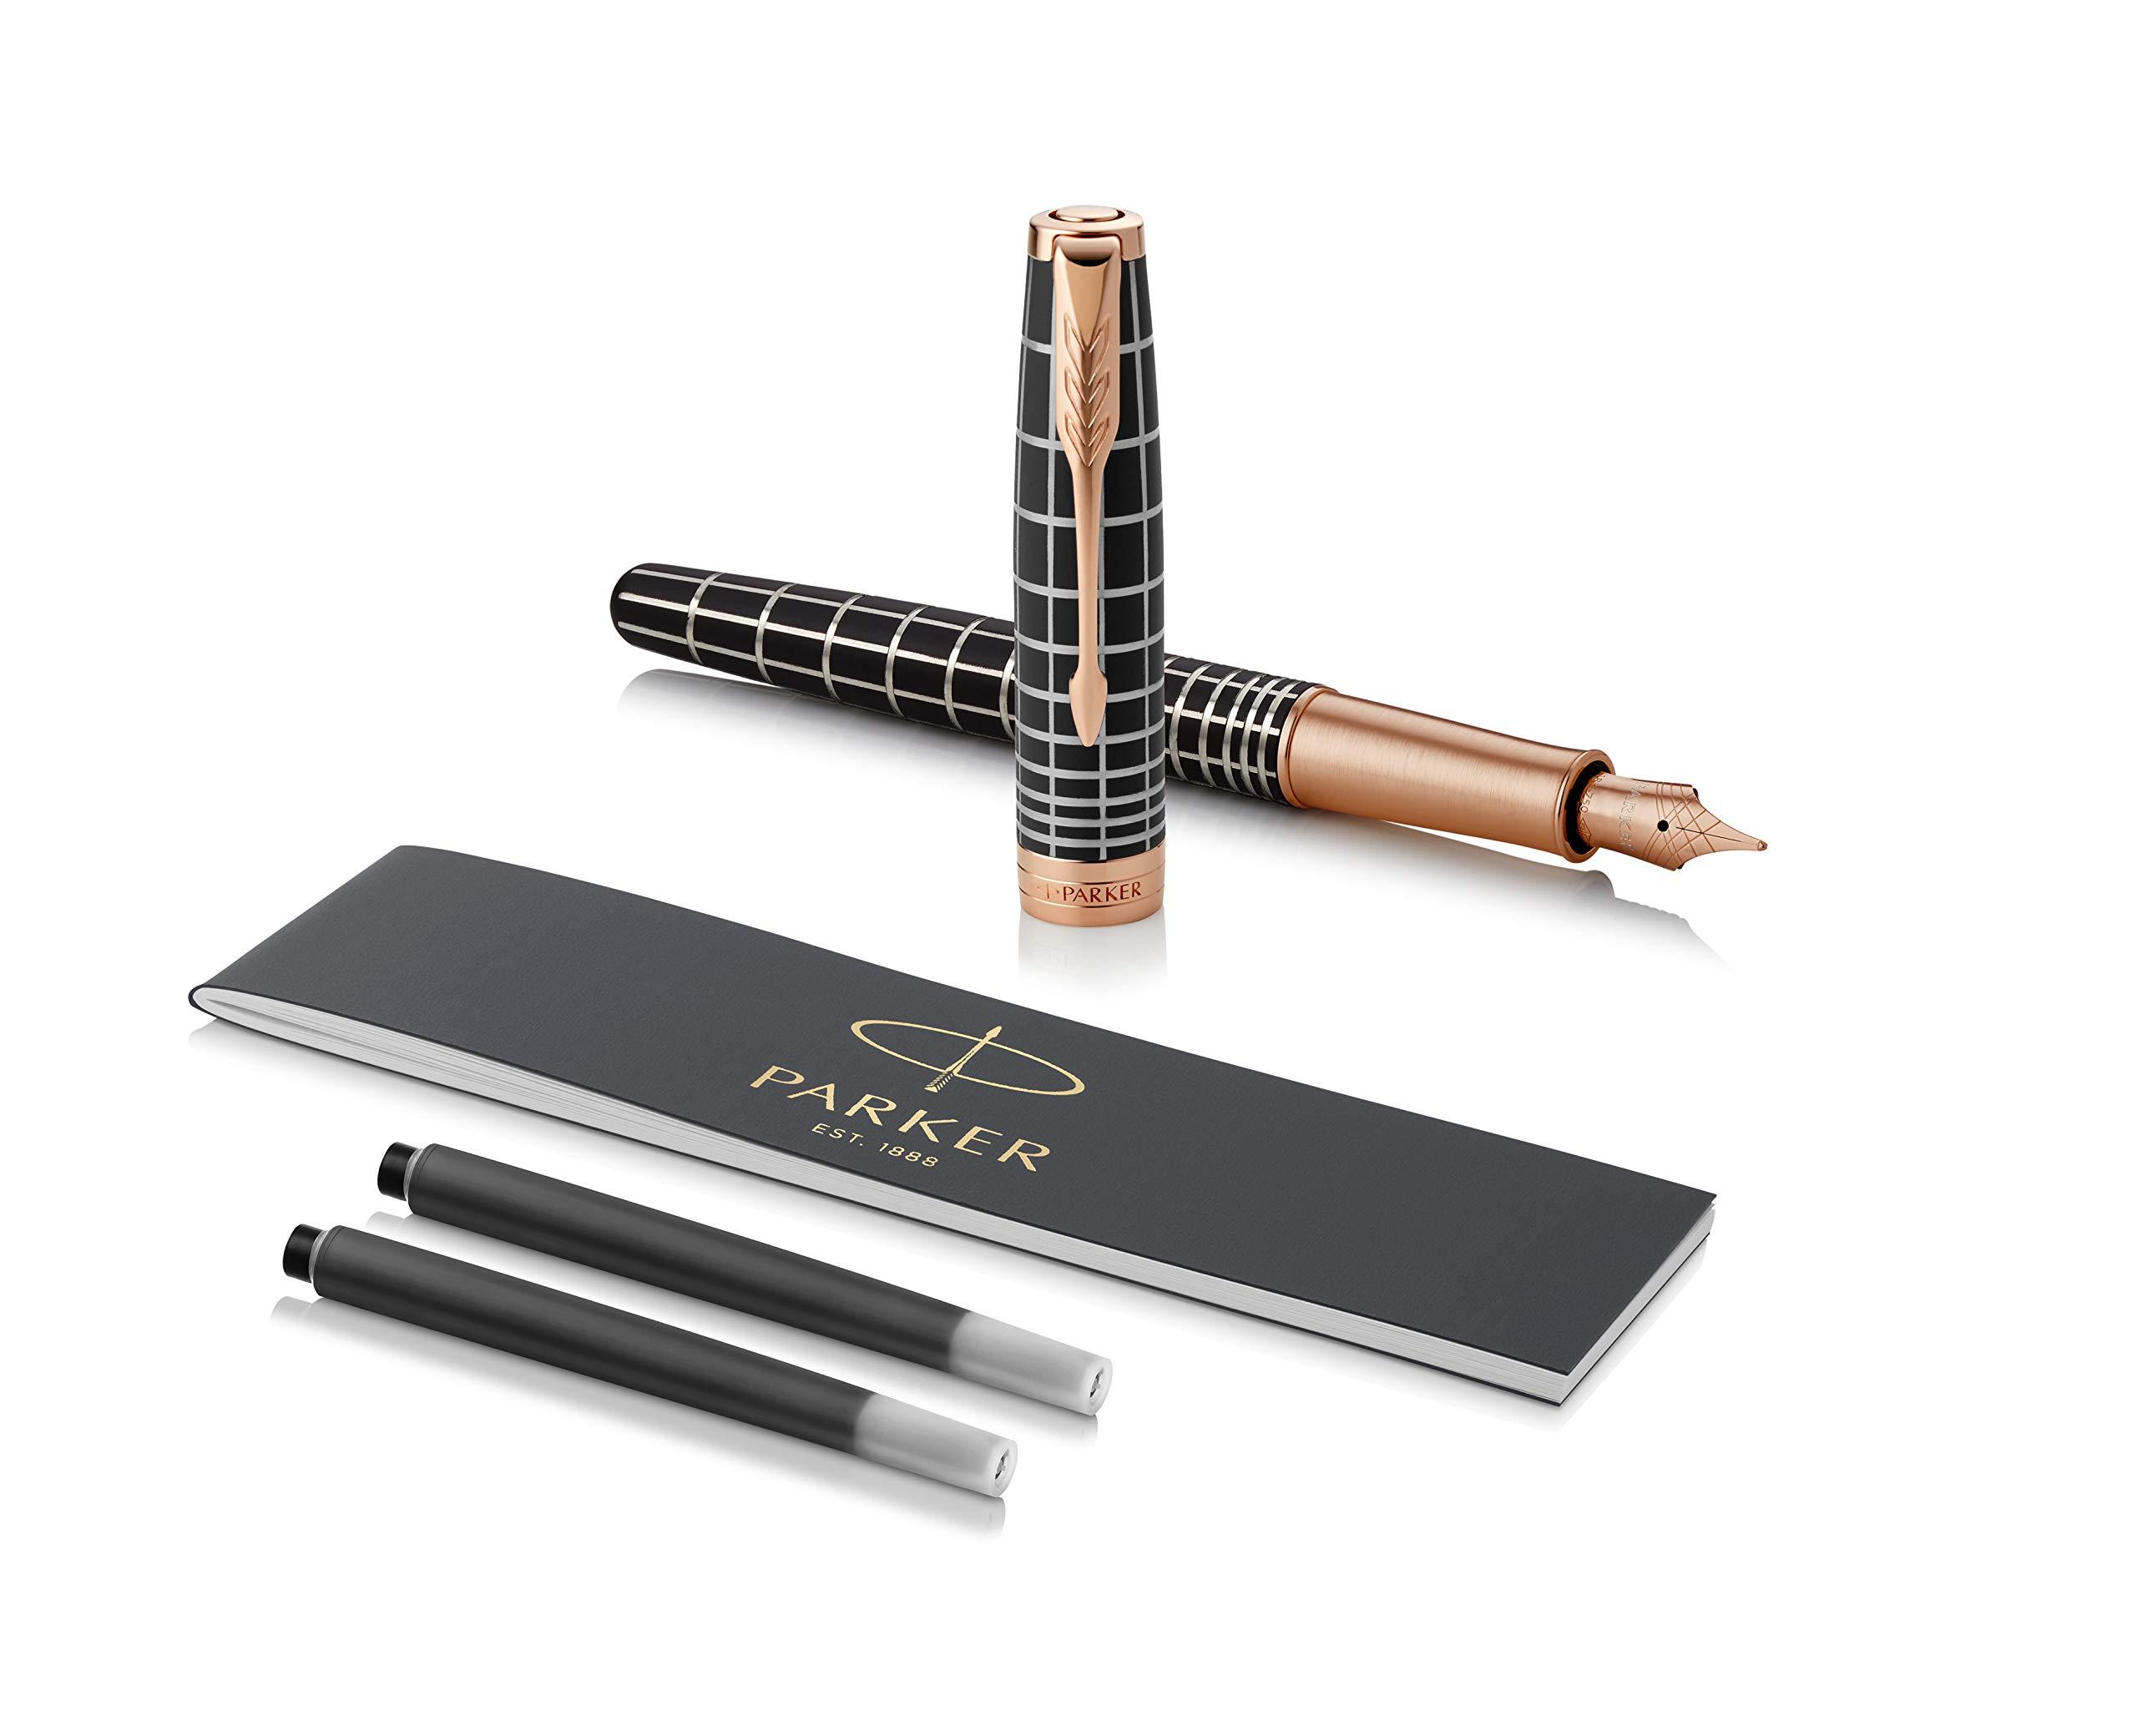 PARKER Sonnet Fountain Pen, Prestige Brown Rubber with Rose Gold Trim, Solid 18k Gold Fine Nib by Parker (Image #1)